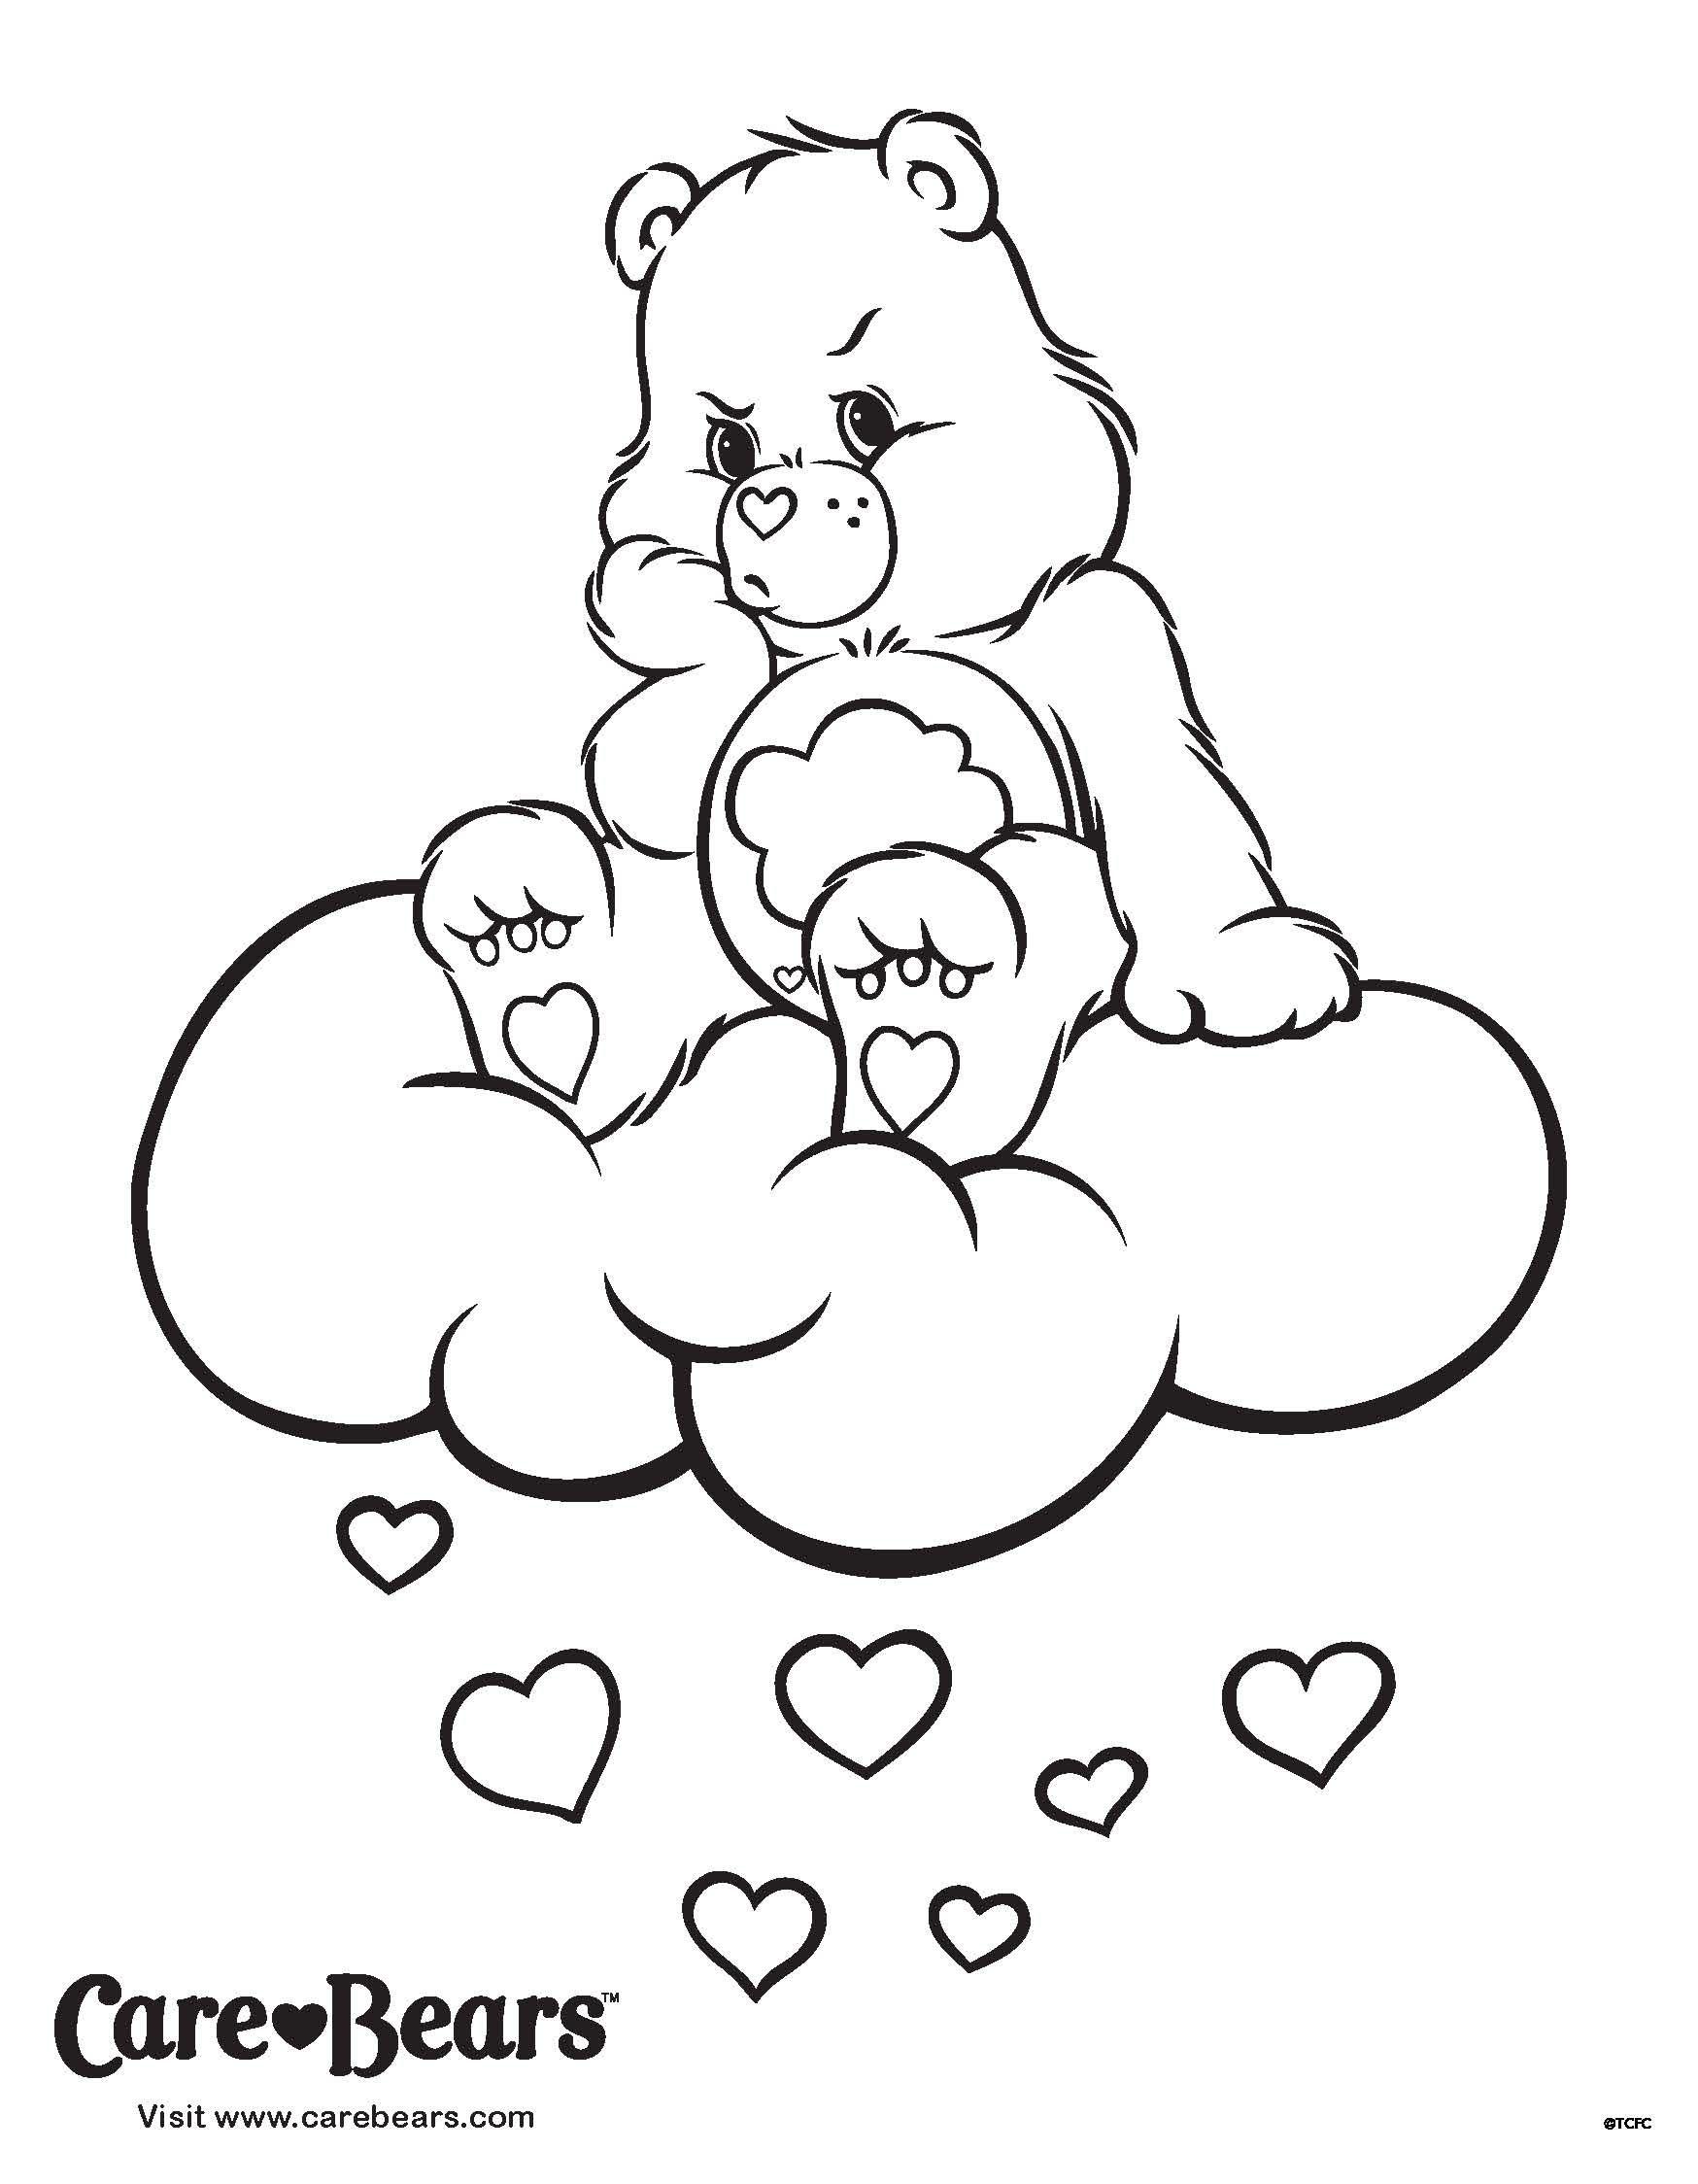 Care Bears Coloring Sheet: Don't Let The Grumpies Get You bestimmt für Malvorlagen Babybauch